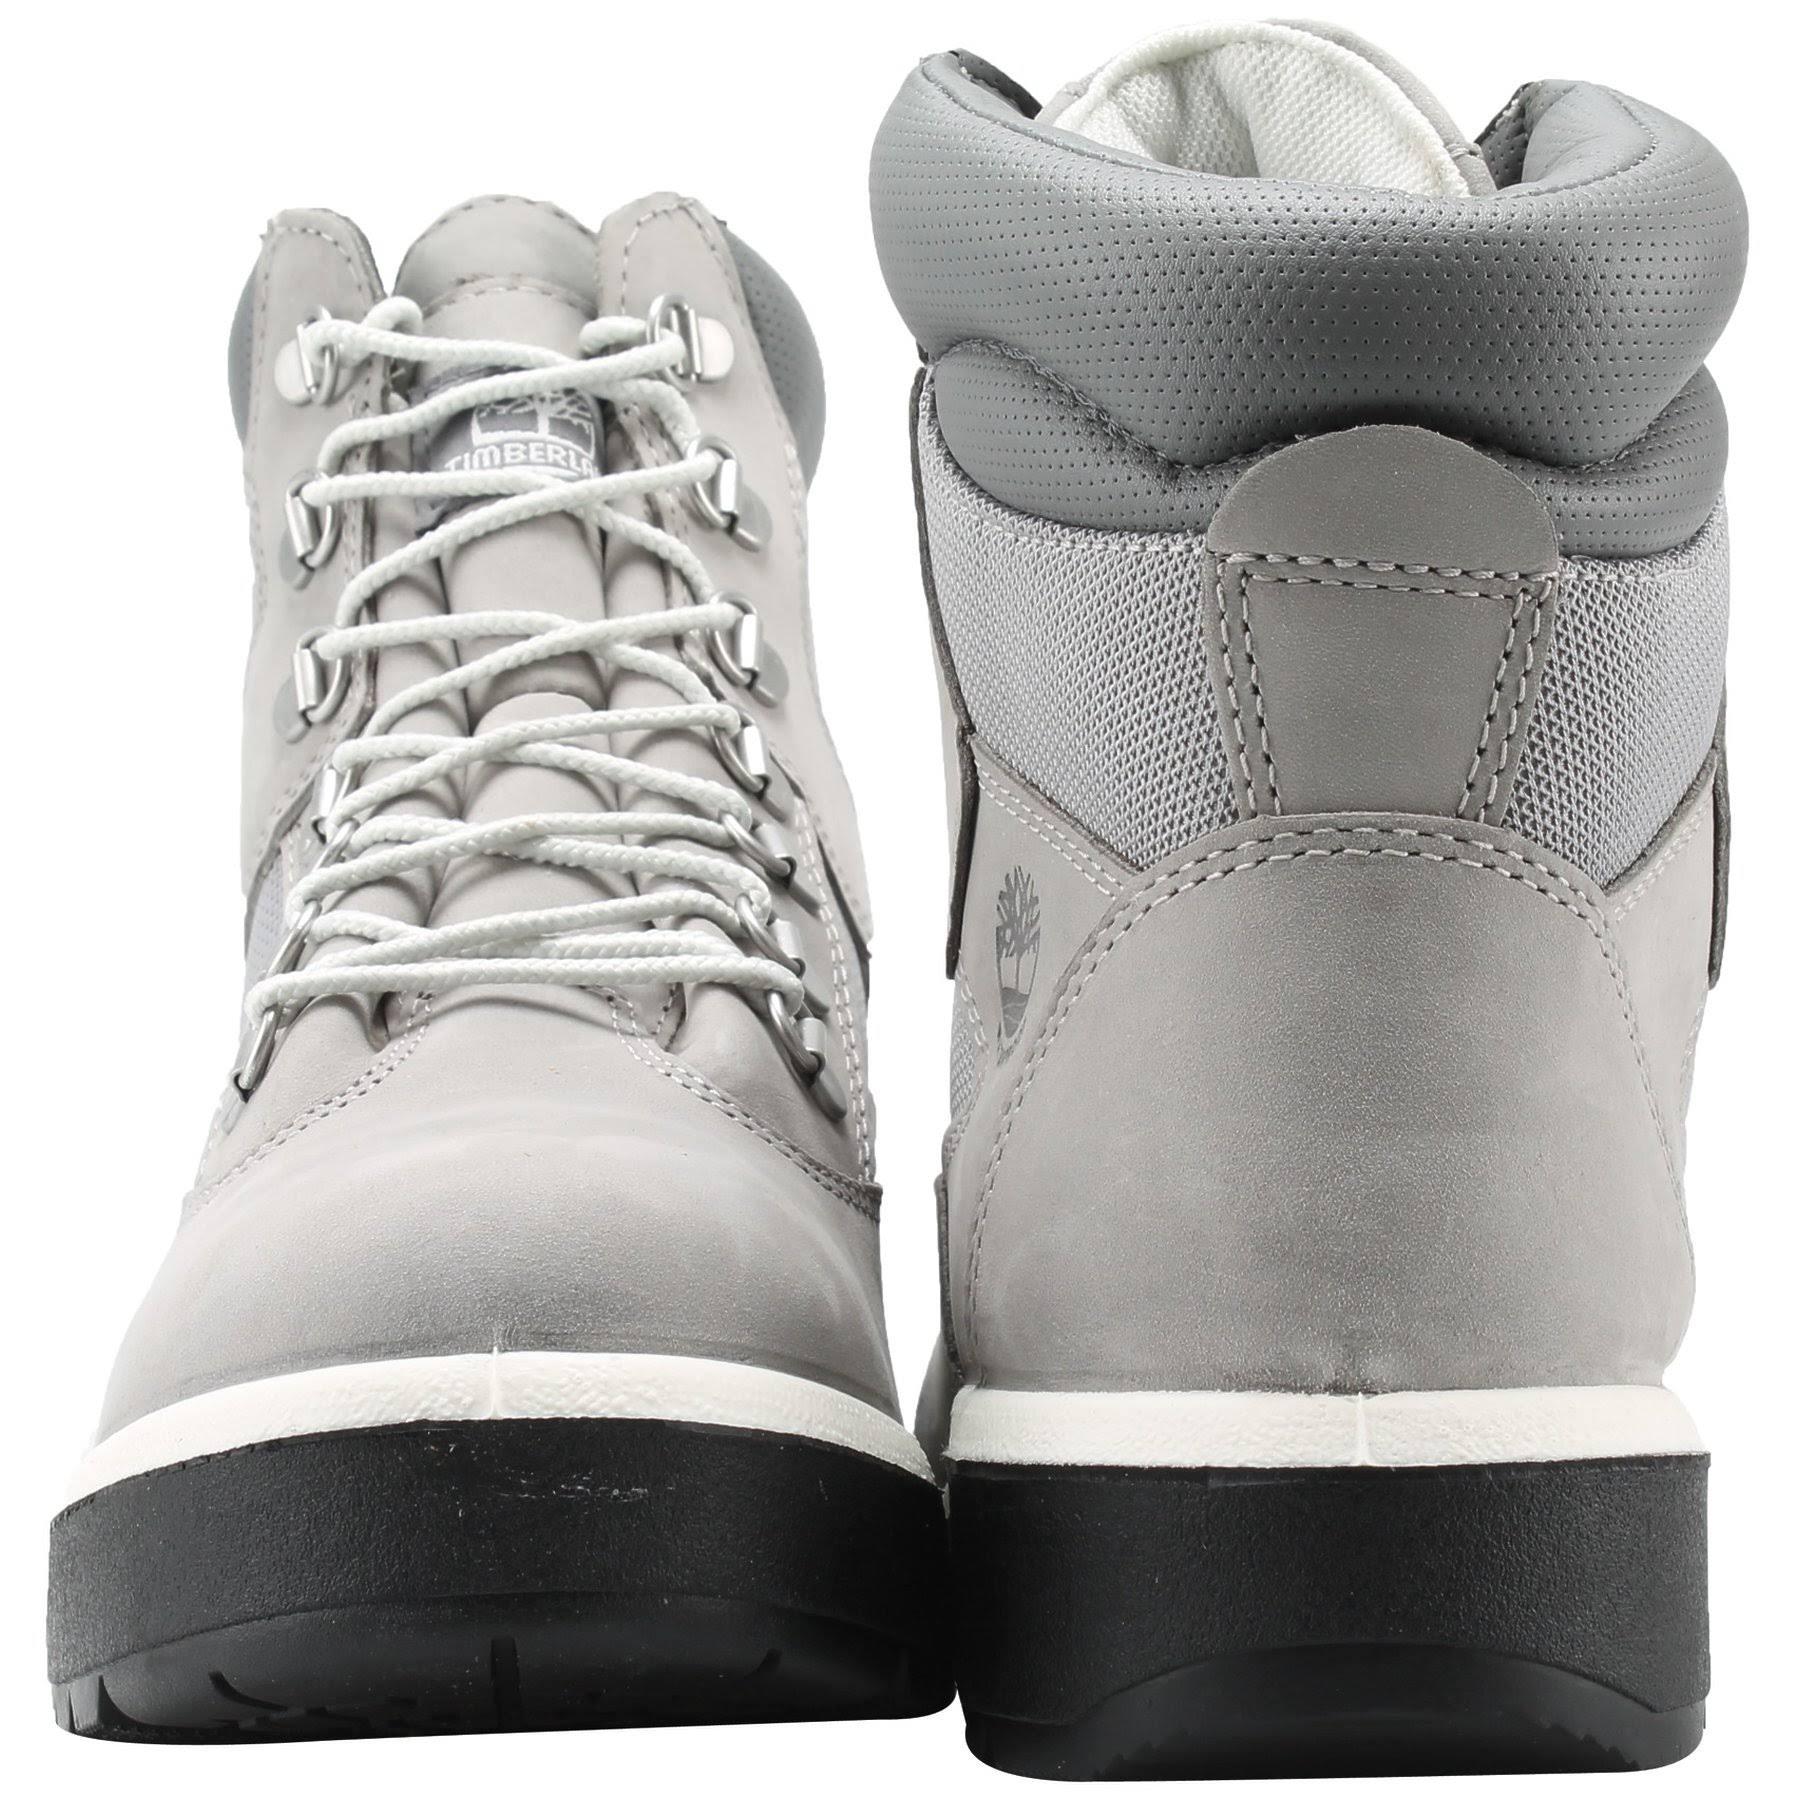 Grey 6 Tb0a1jpj Waterproof Inch Gray Boot Men's Field Timberland daYpwqd